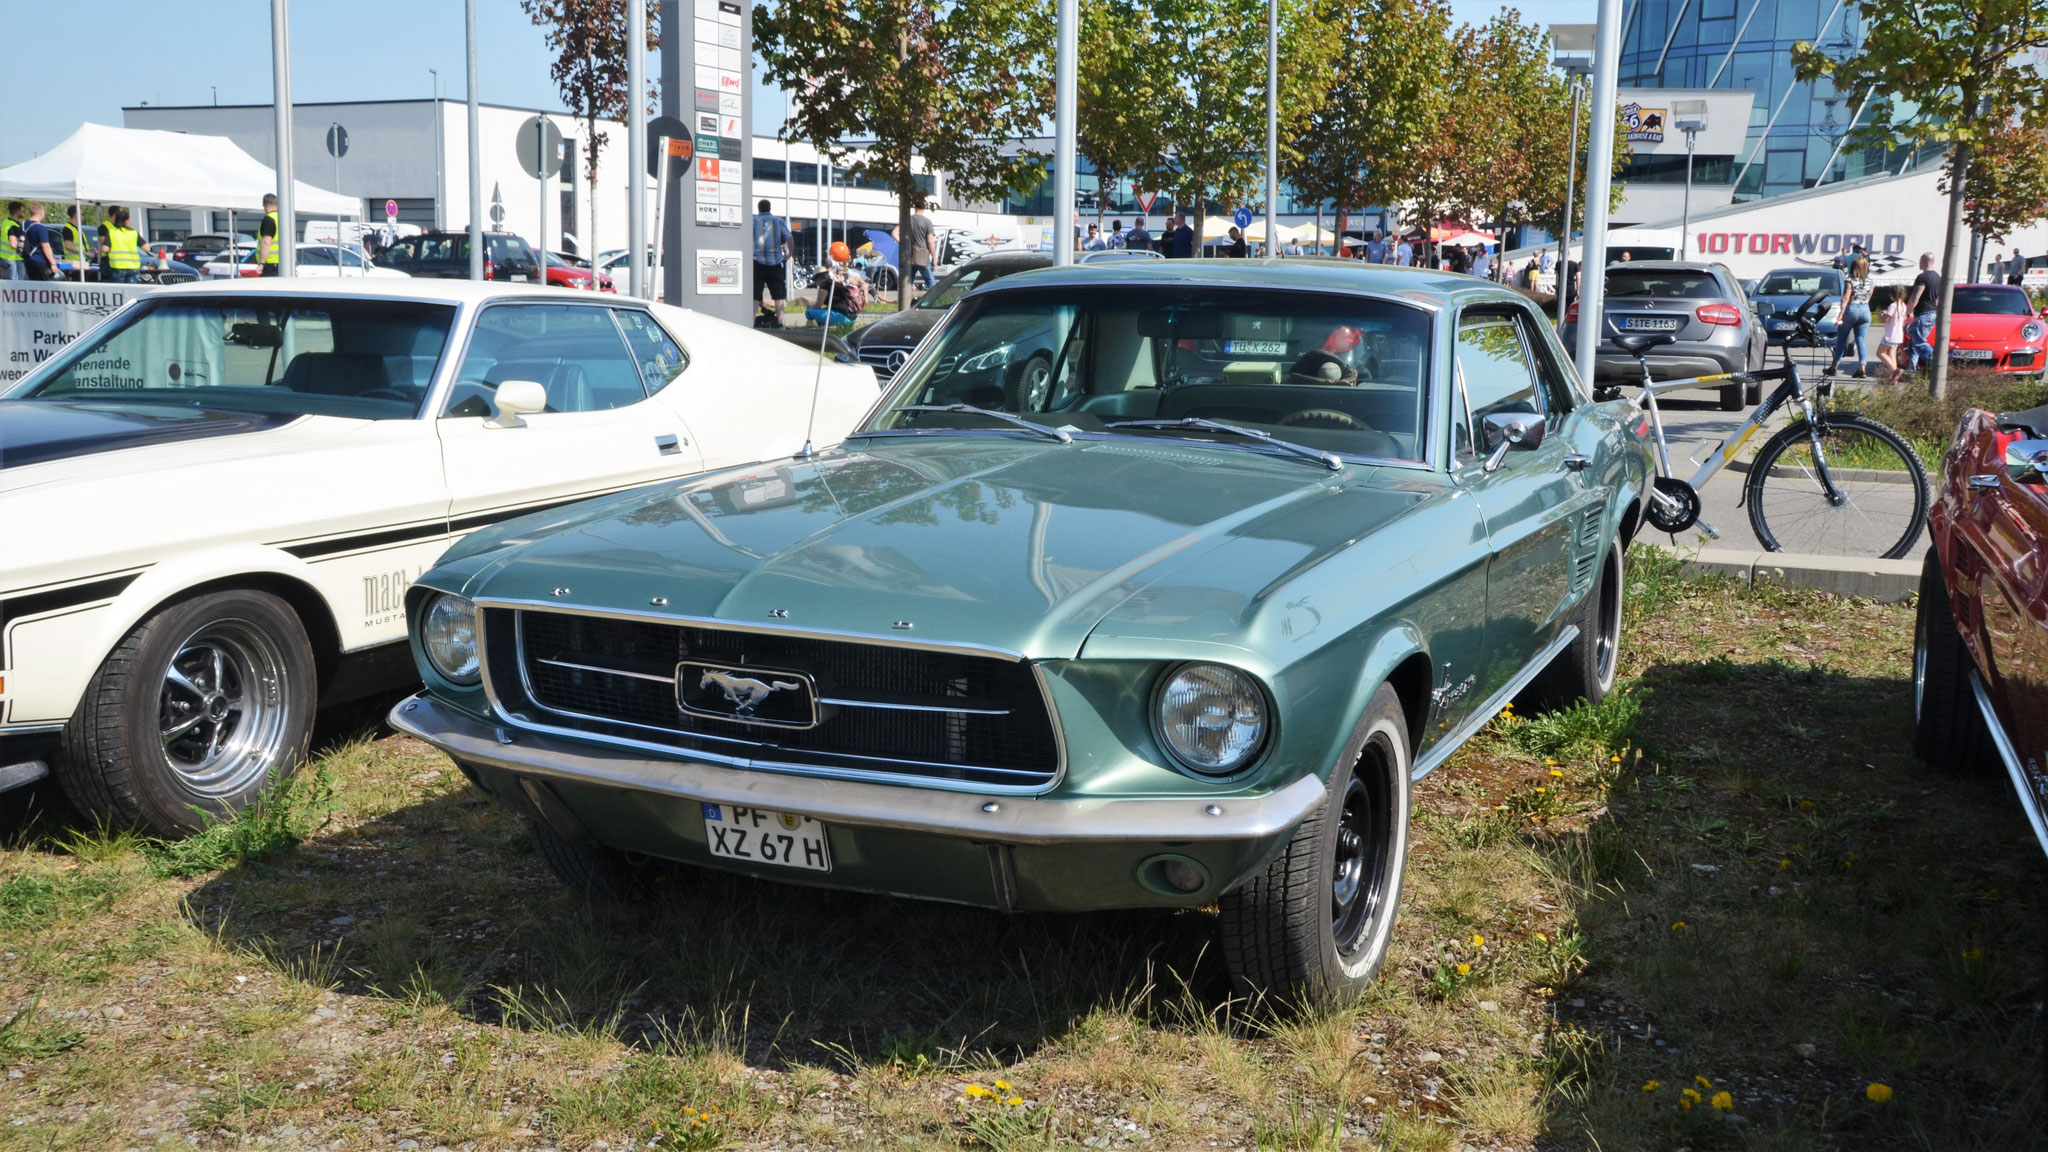 Mustang I - PF-XZ-67H